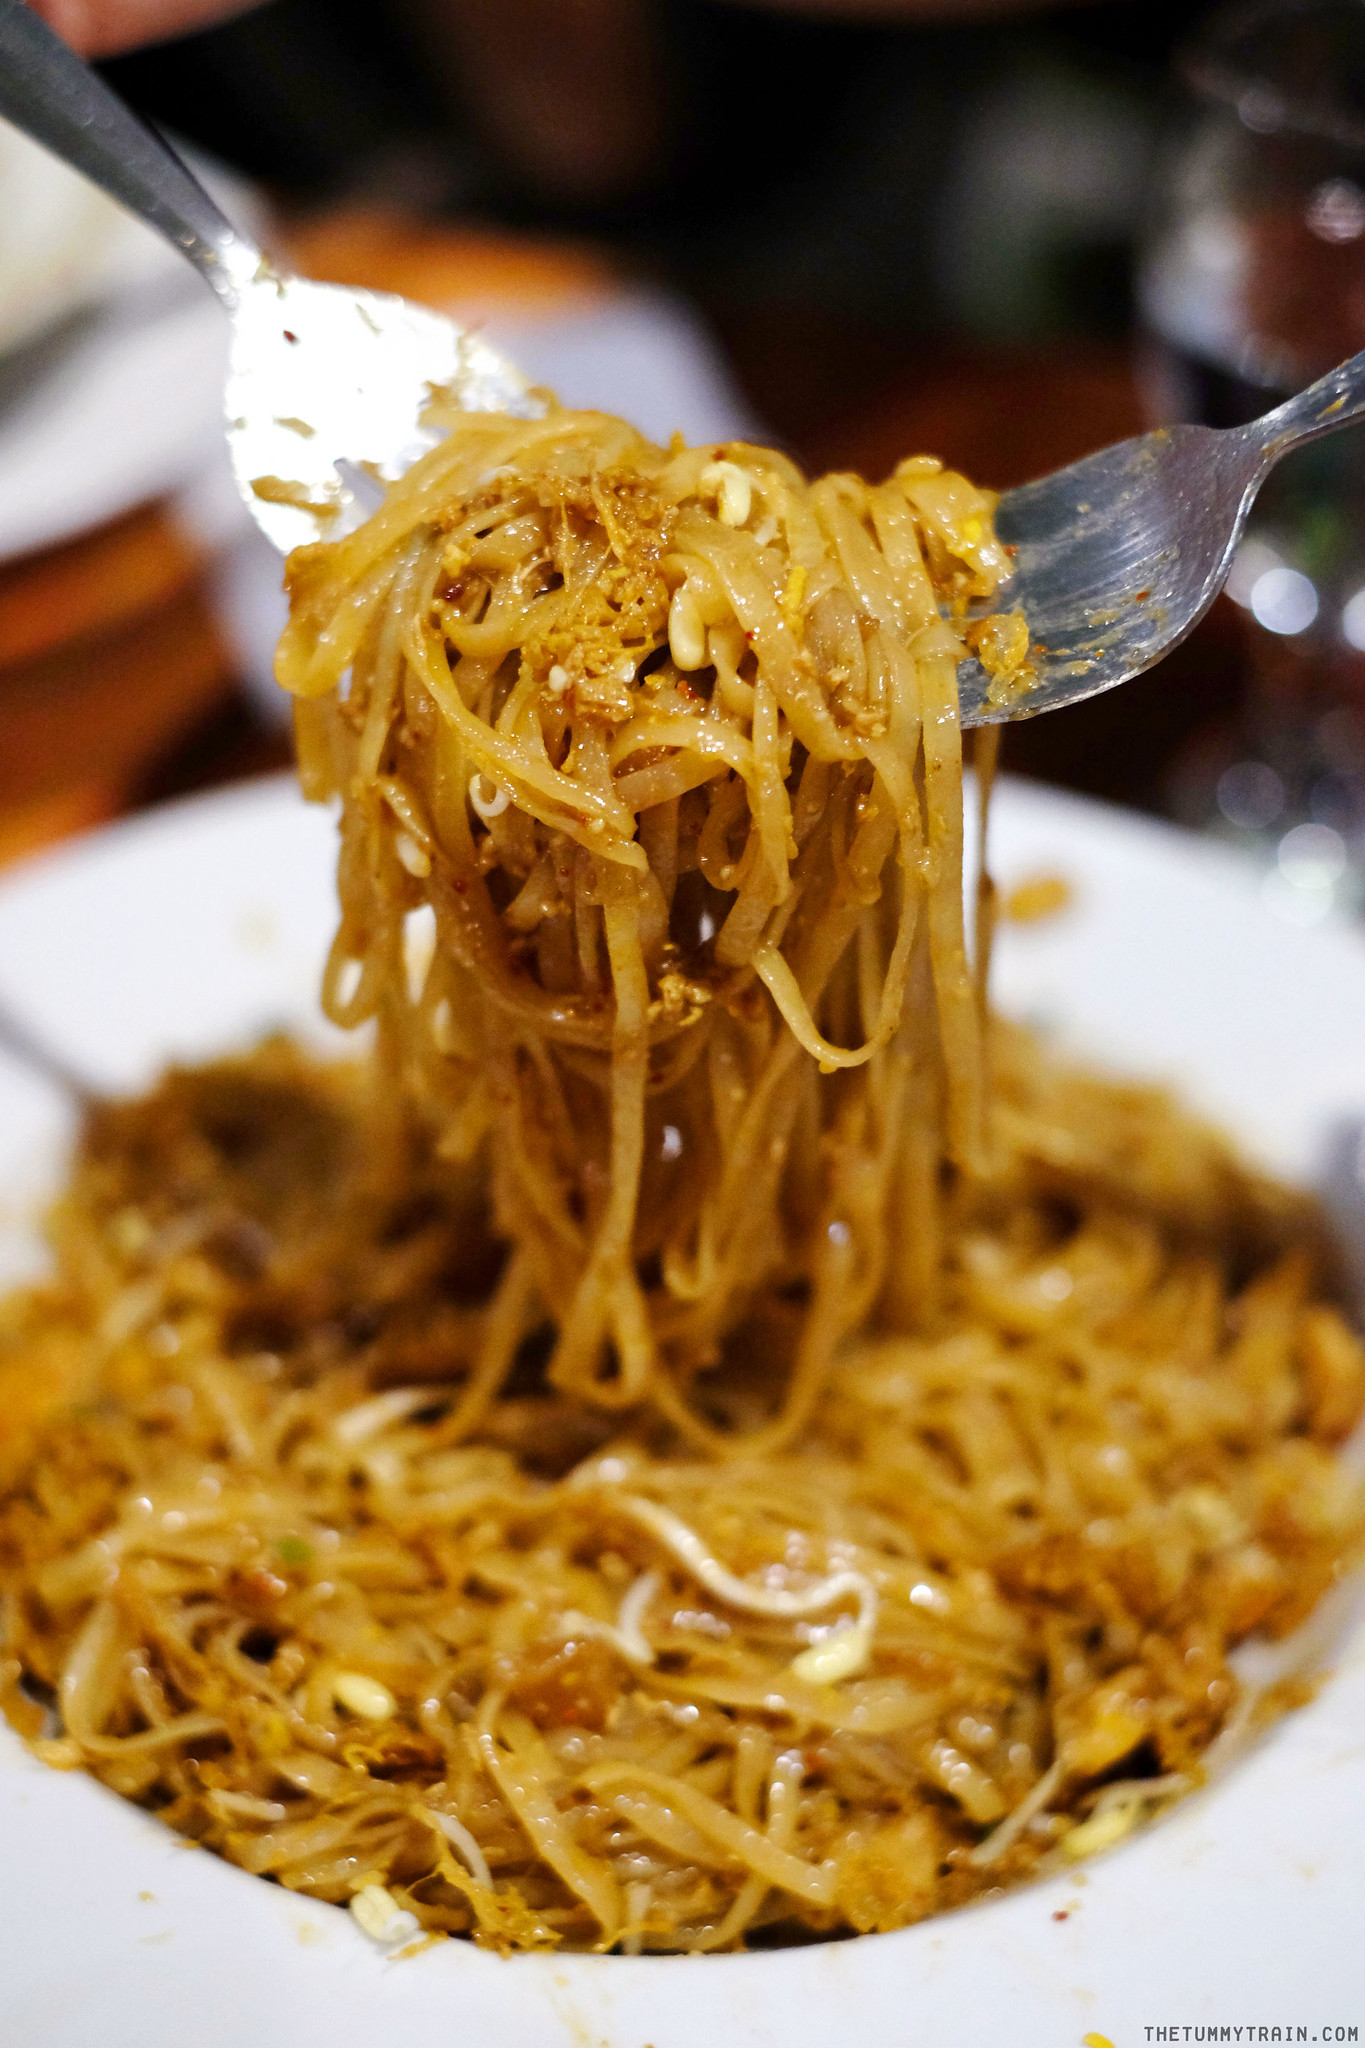 33701592562 d343d431c7 k - Lime & Basil Thai Restaurant Tagaytay makes case as a go-to Thai place